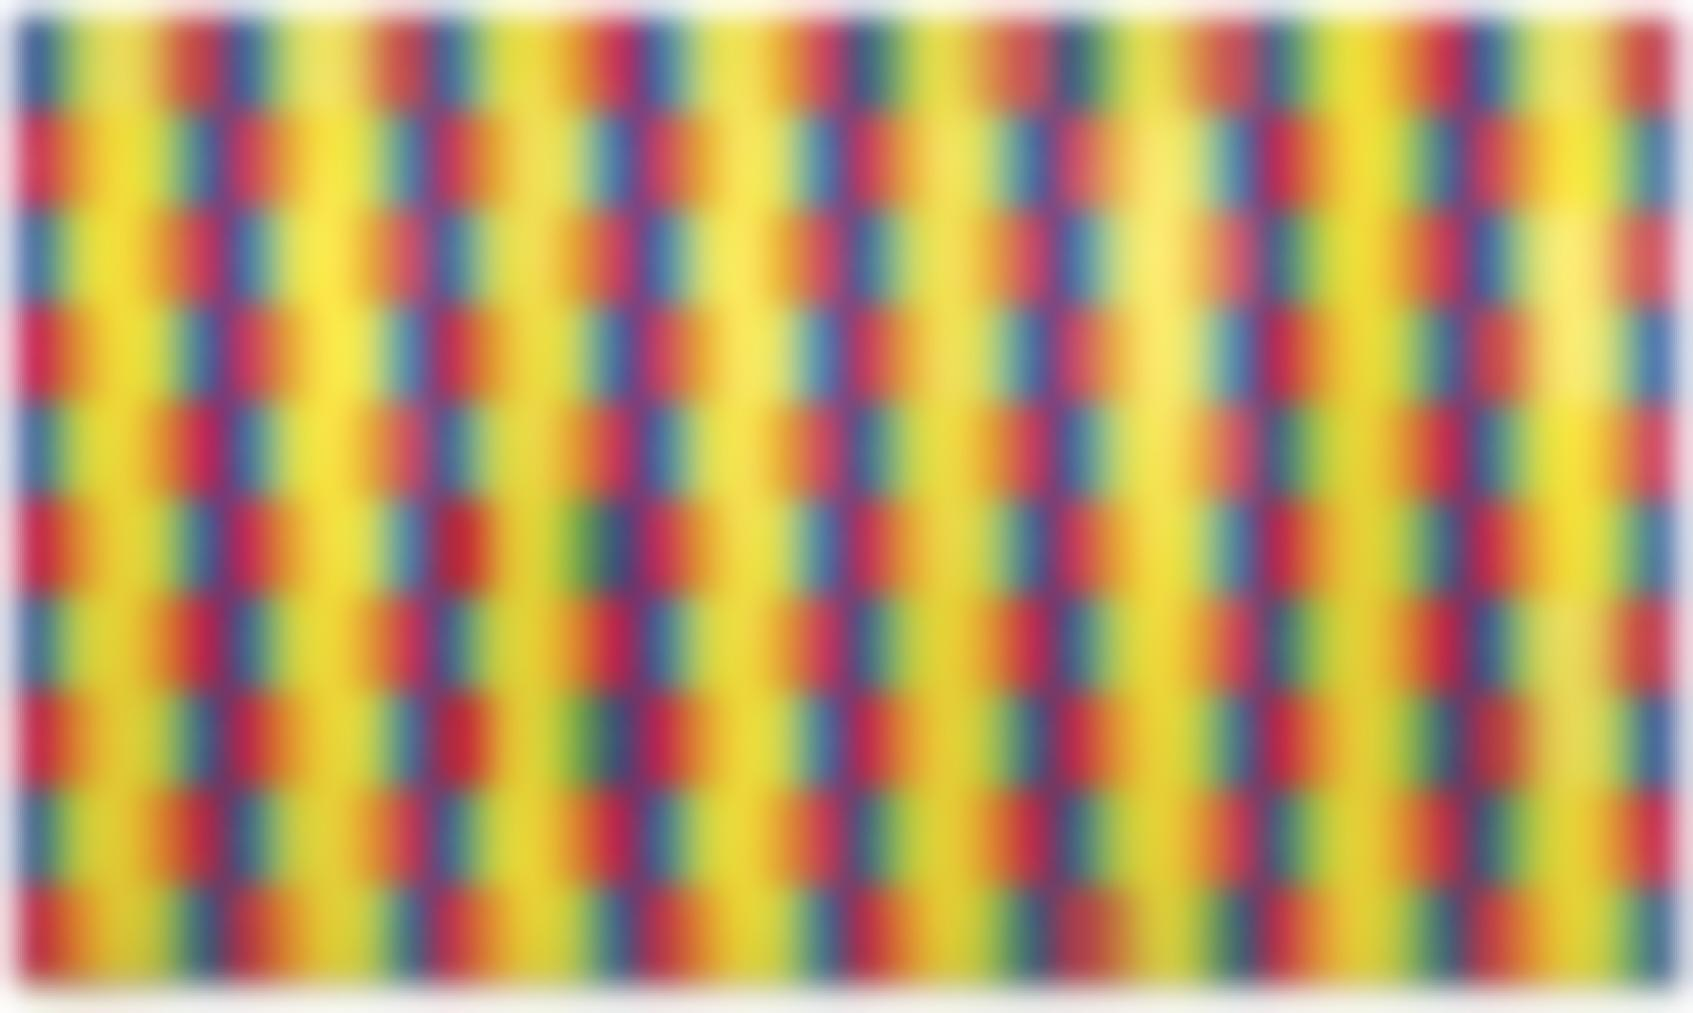 Getulio Alviani-Cromia Spettrologica-1982